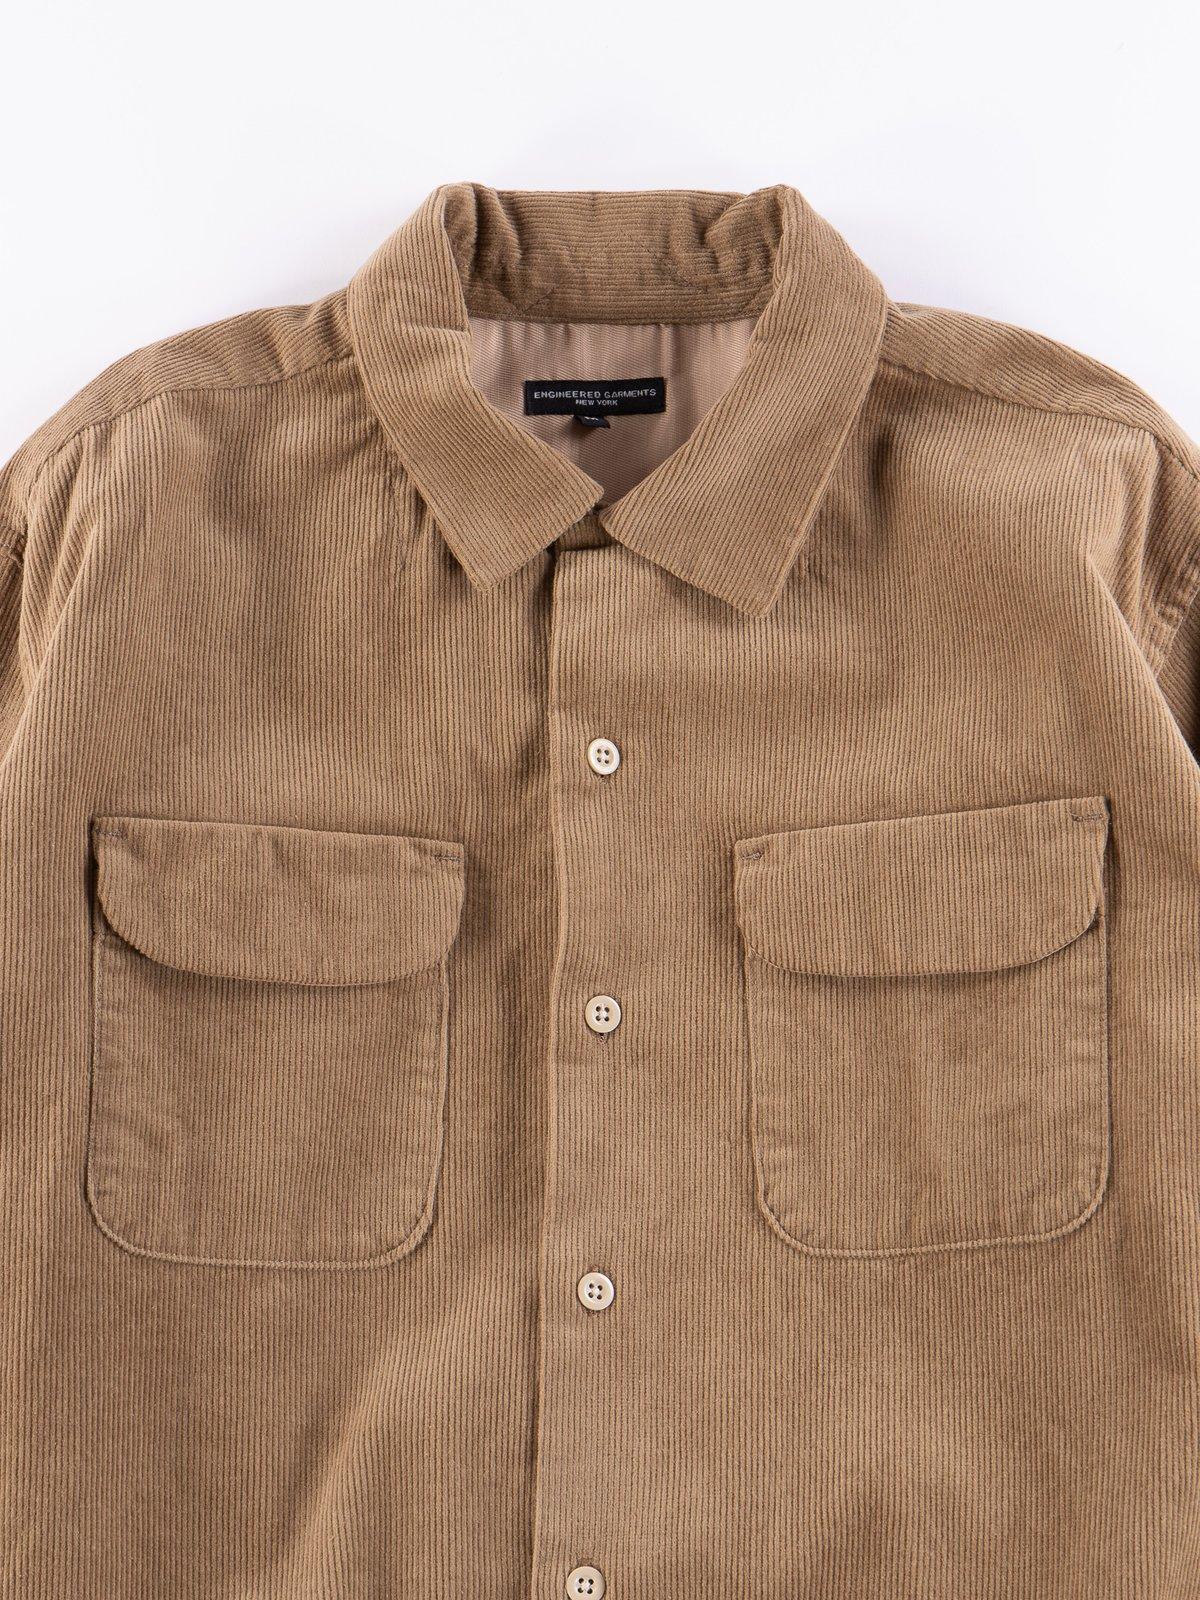 Khaki 14W Corduroy Classic Shirt - Image 3